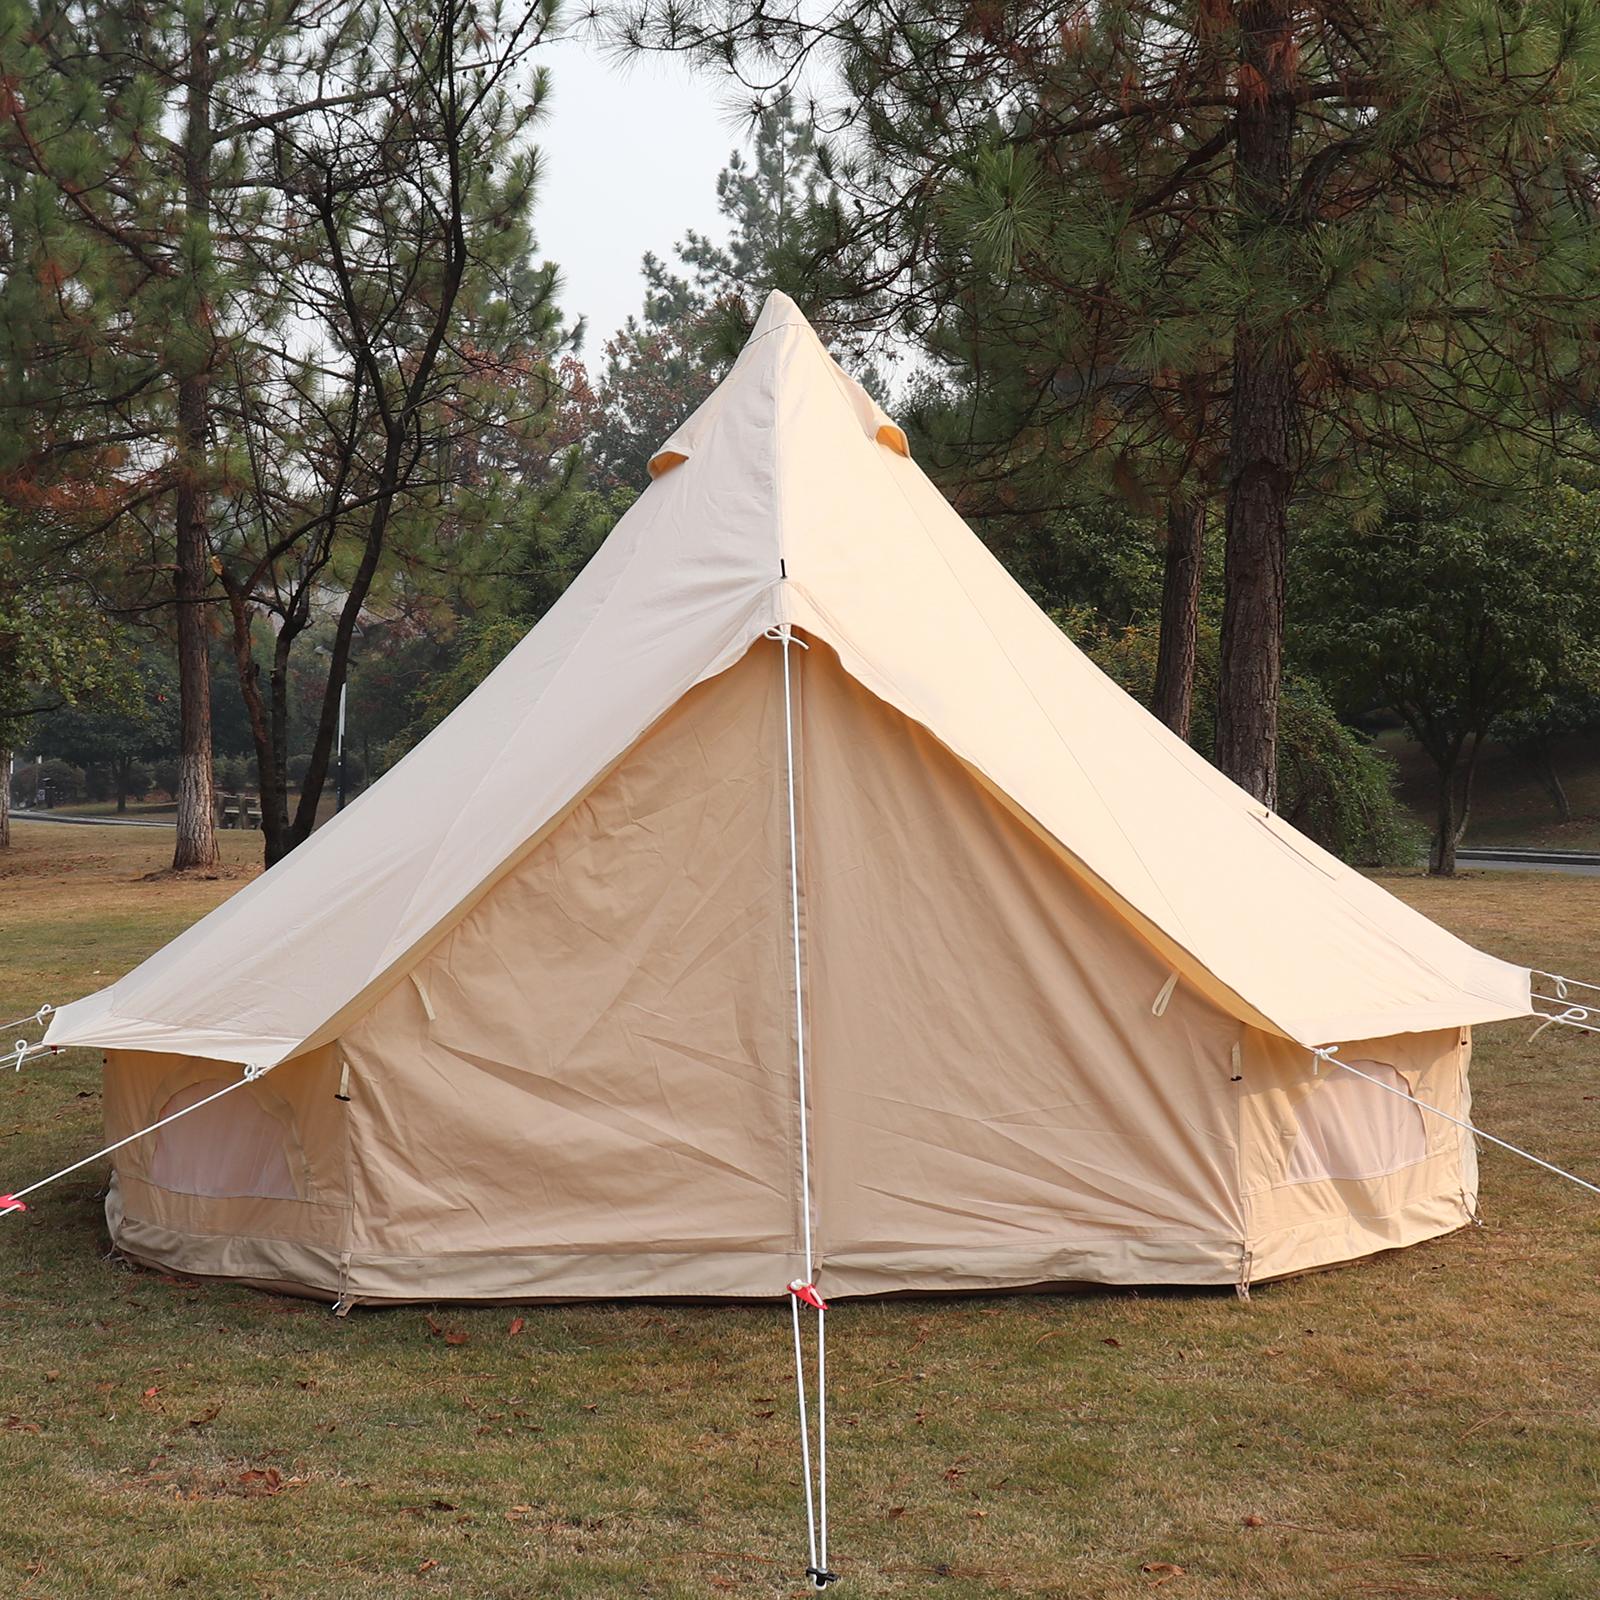 4-Season-Bell-Tent-3-4-5-6M-Waterproof-Cotton-Canvas-Glamping-Camping-Beach-US thumbnail 36